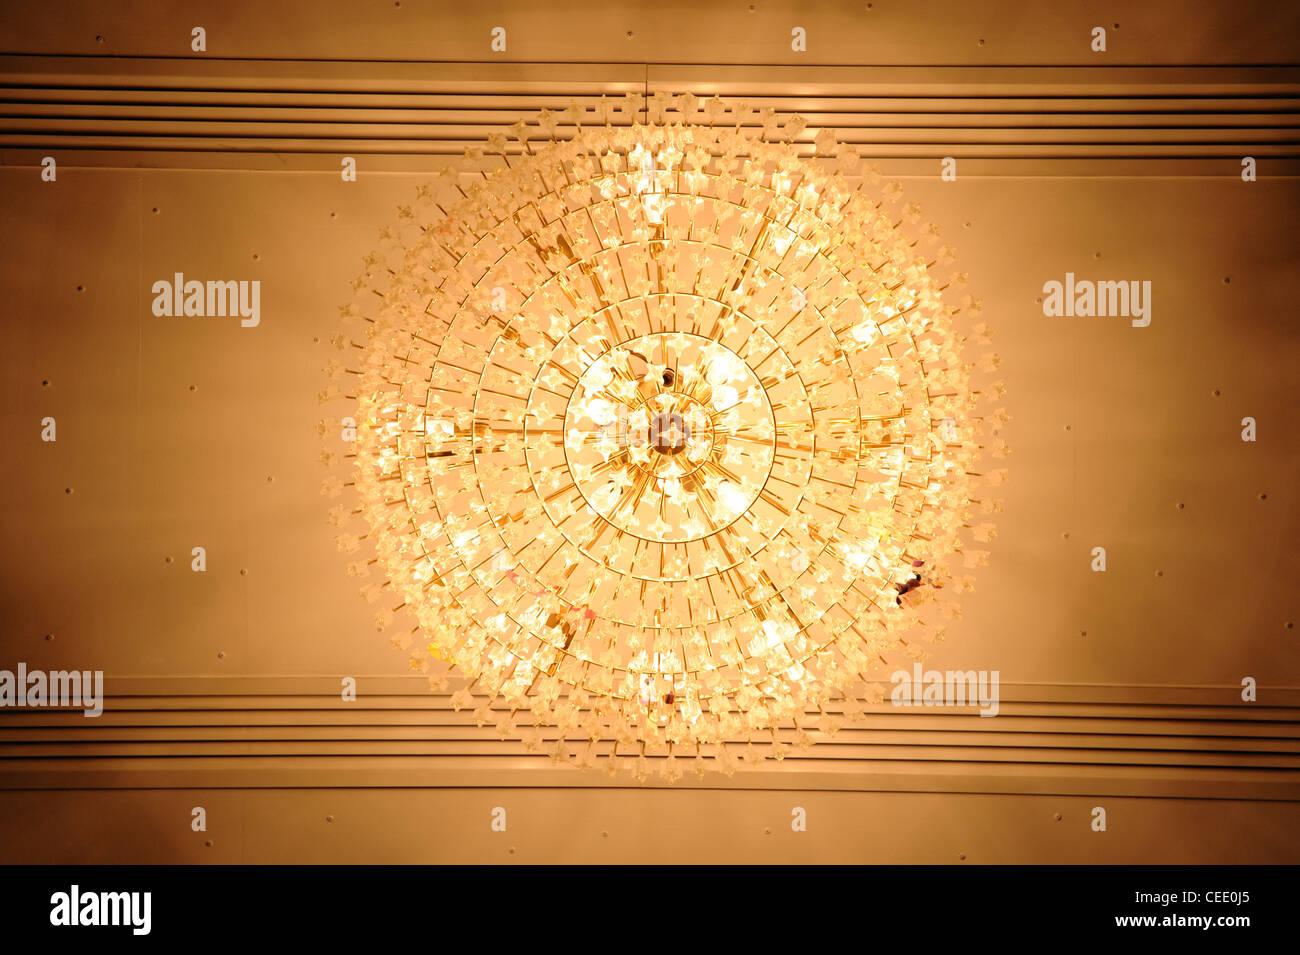 Chandelier light - Stock Image